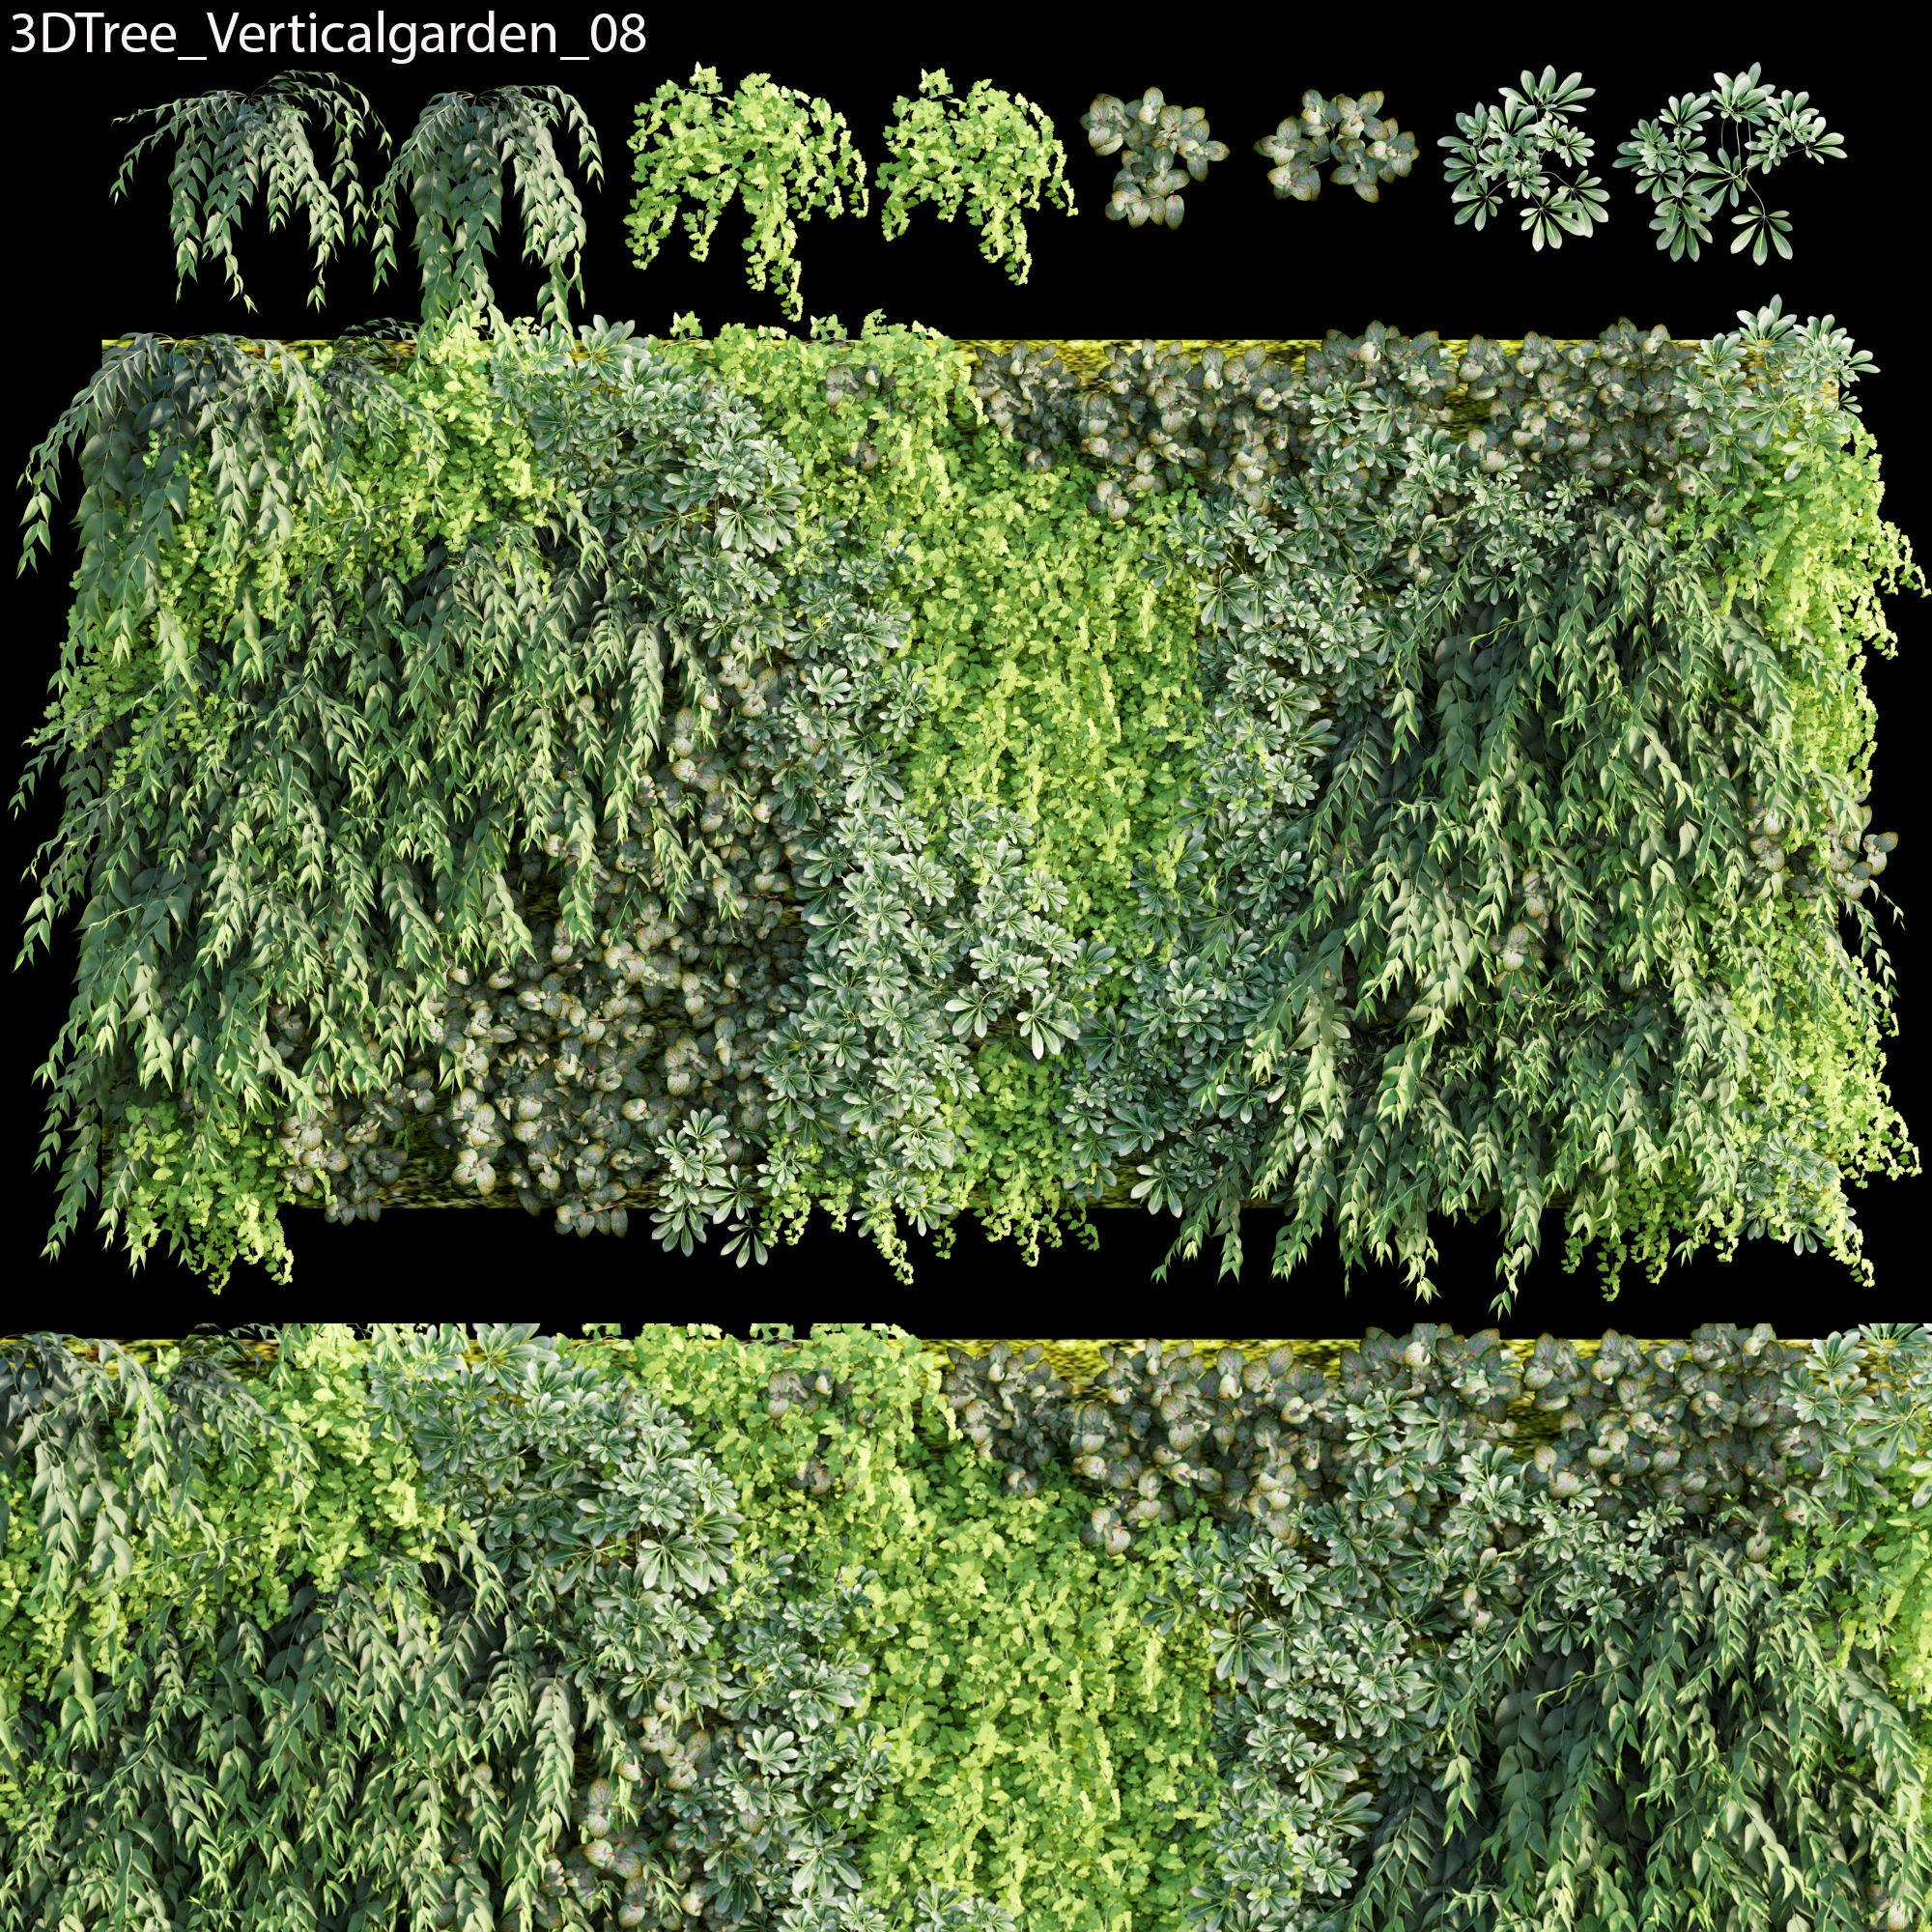 Verticalgarden - Green wall 08